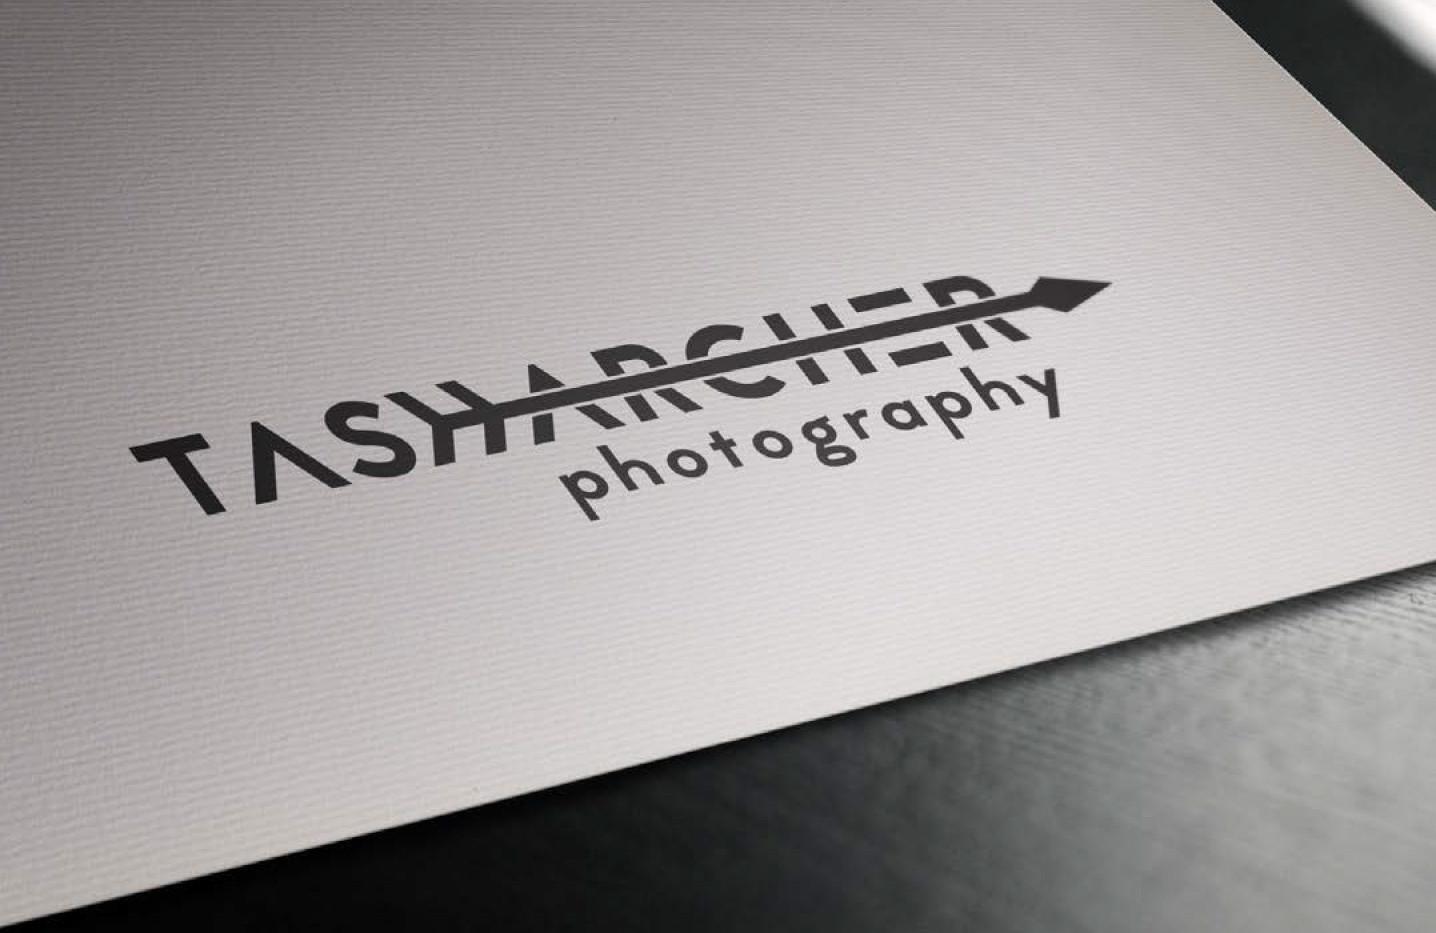 TashArcherPhotography-2.jpg